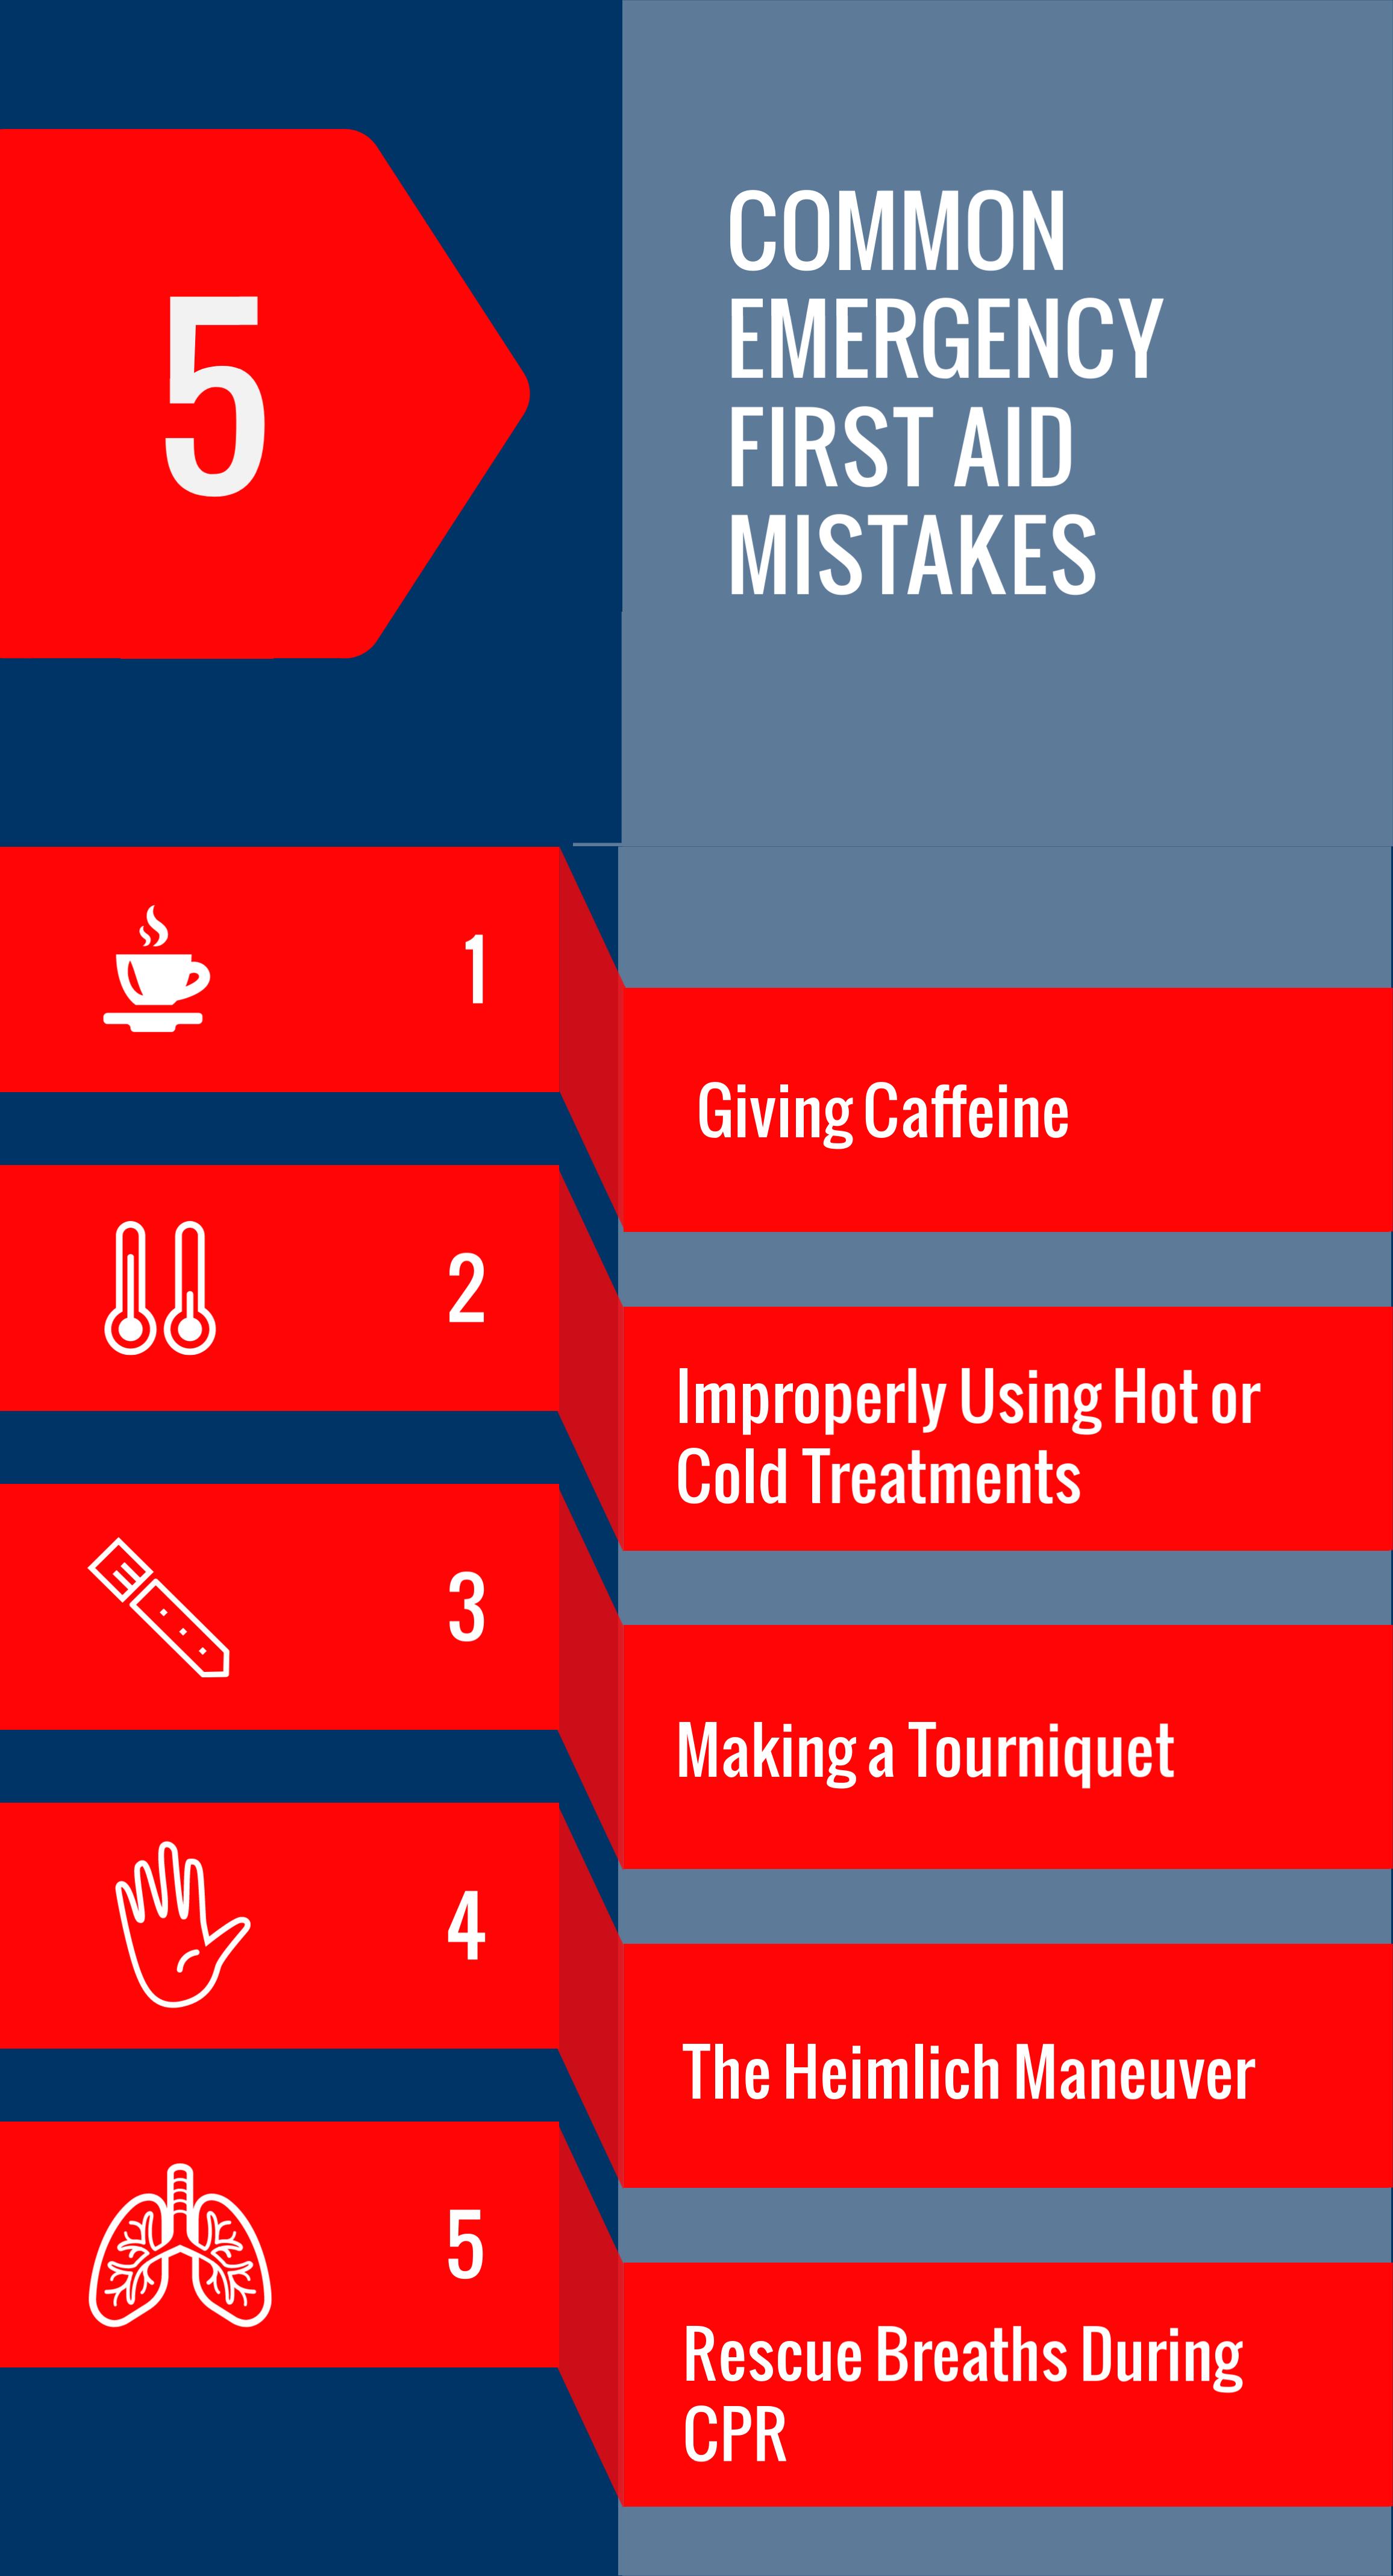 5 Common Emergency First Aid Mistakes, Health Street, LLC, Houston